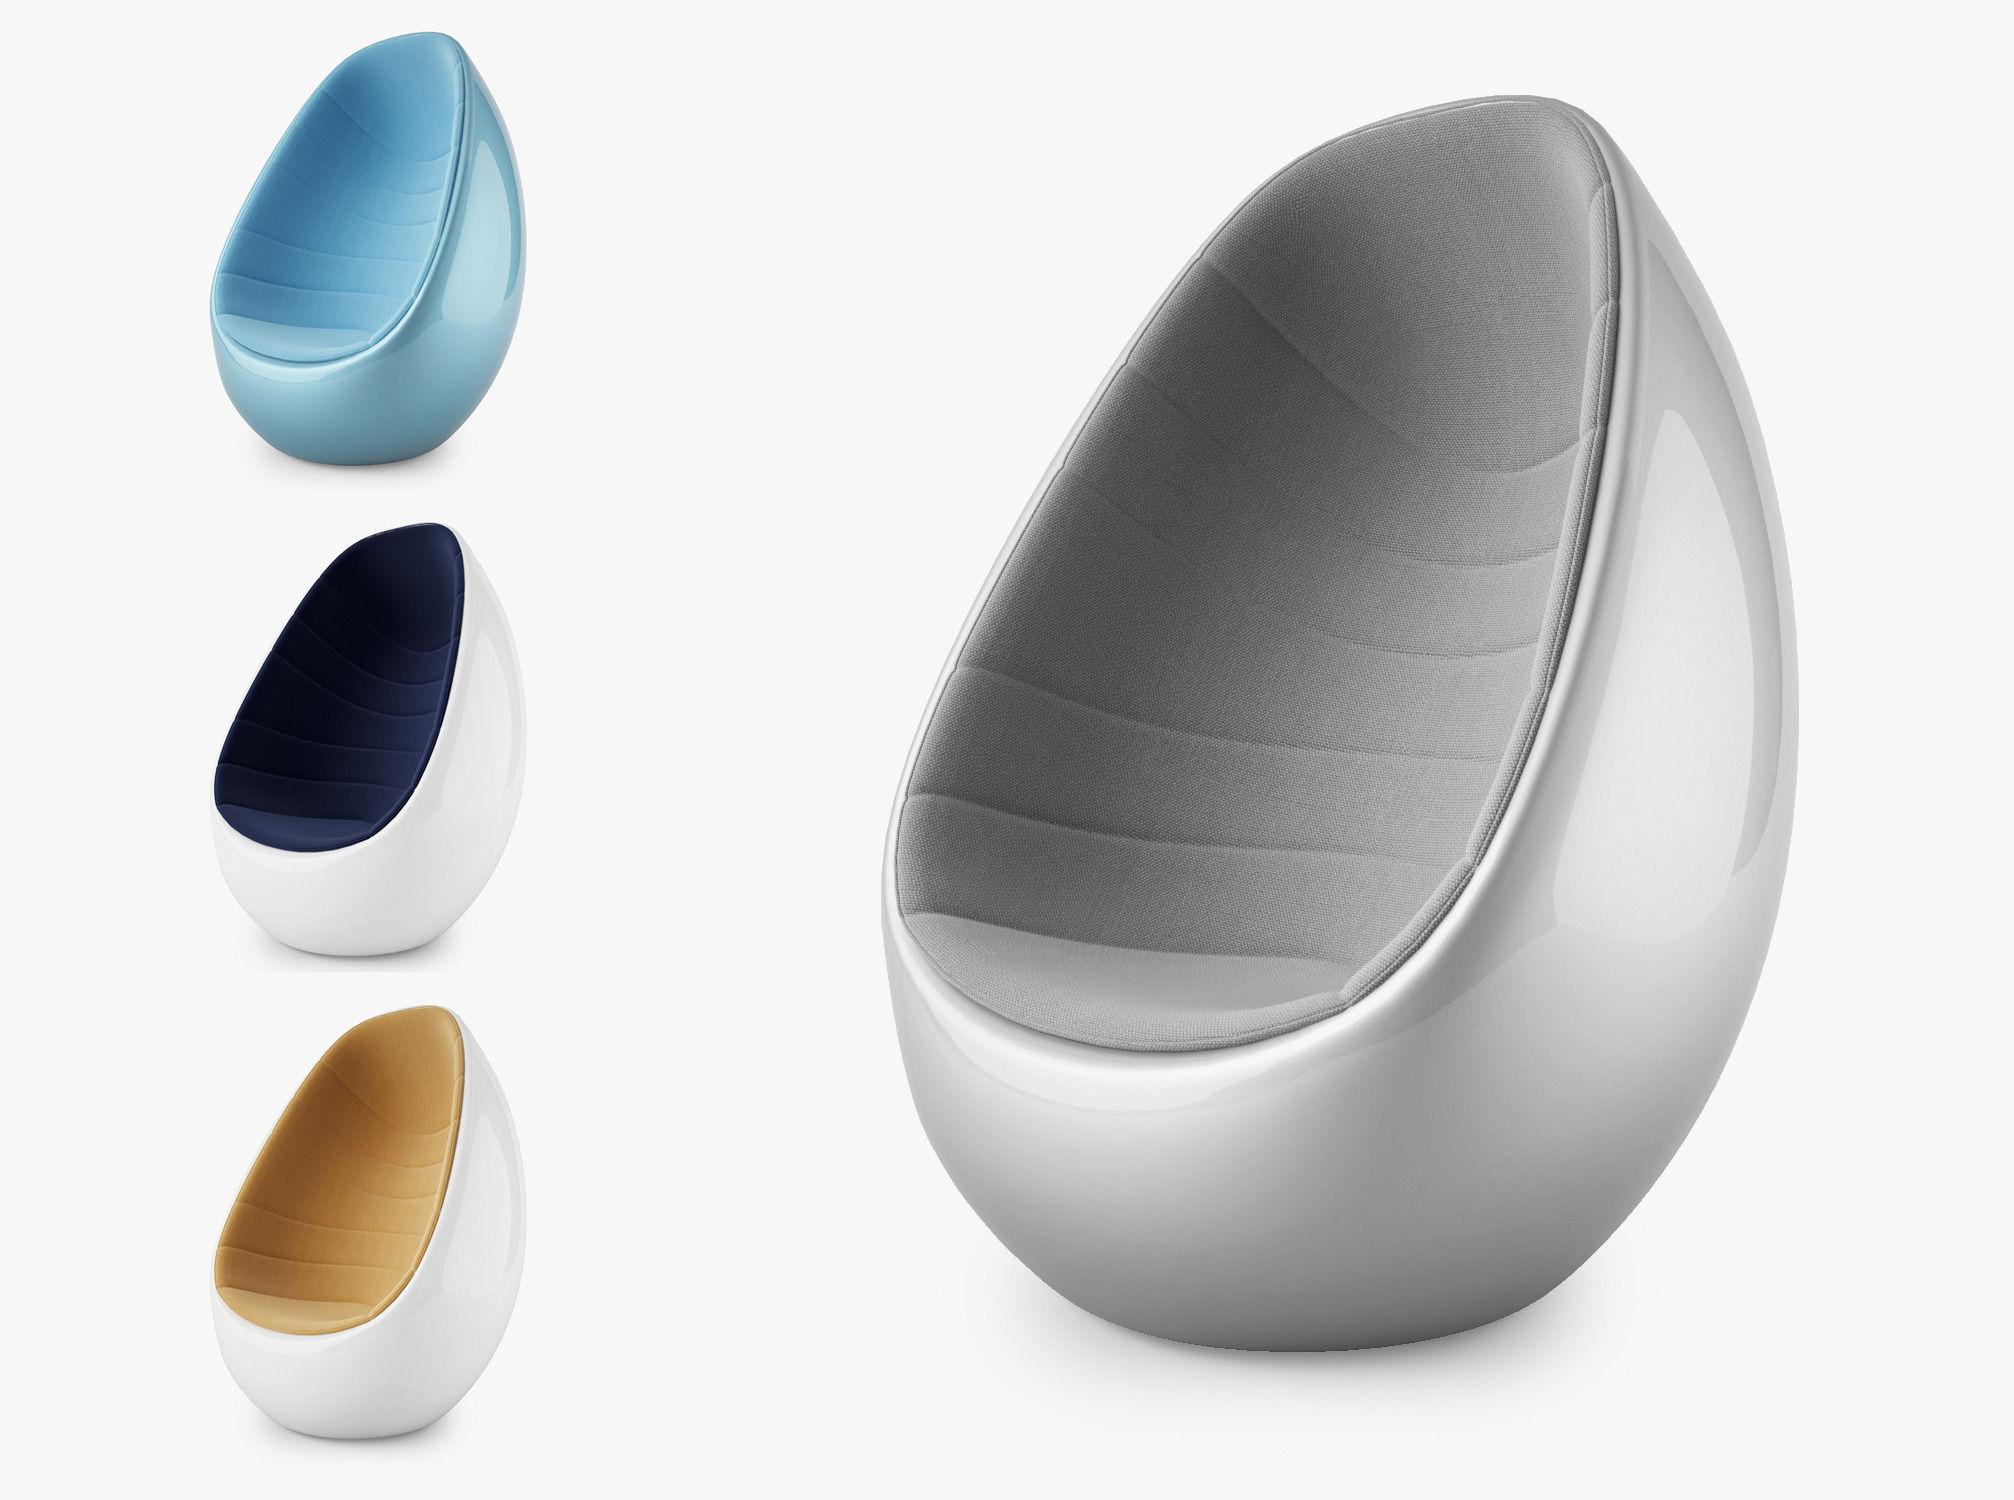 chair design model ergonomic under 100 martela koop by rashid karim 3d max obj mtl fbx